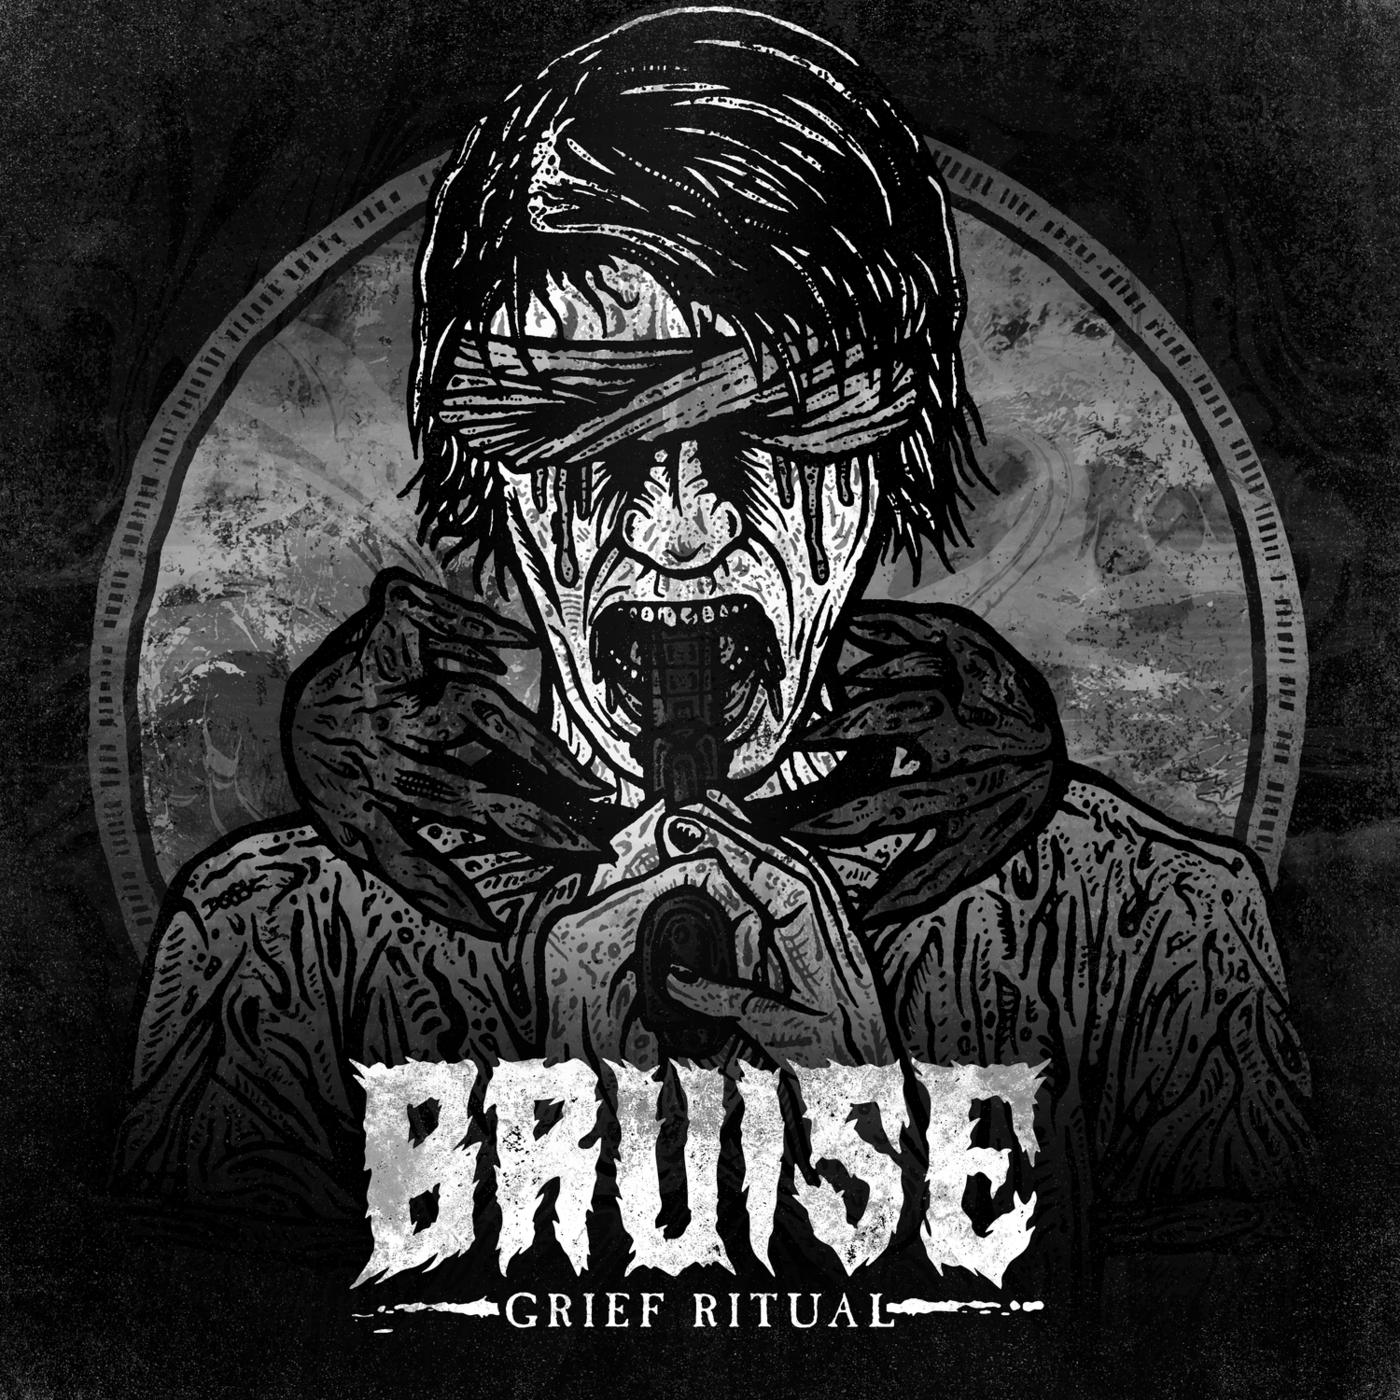 Bruise - Grief Ritual (2018)